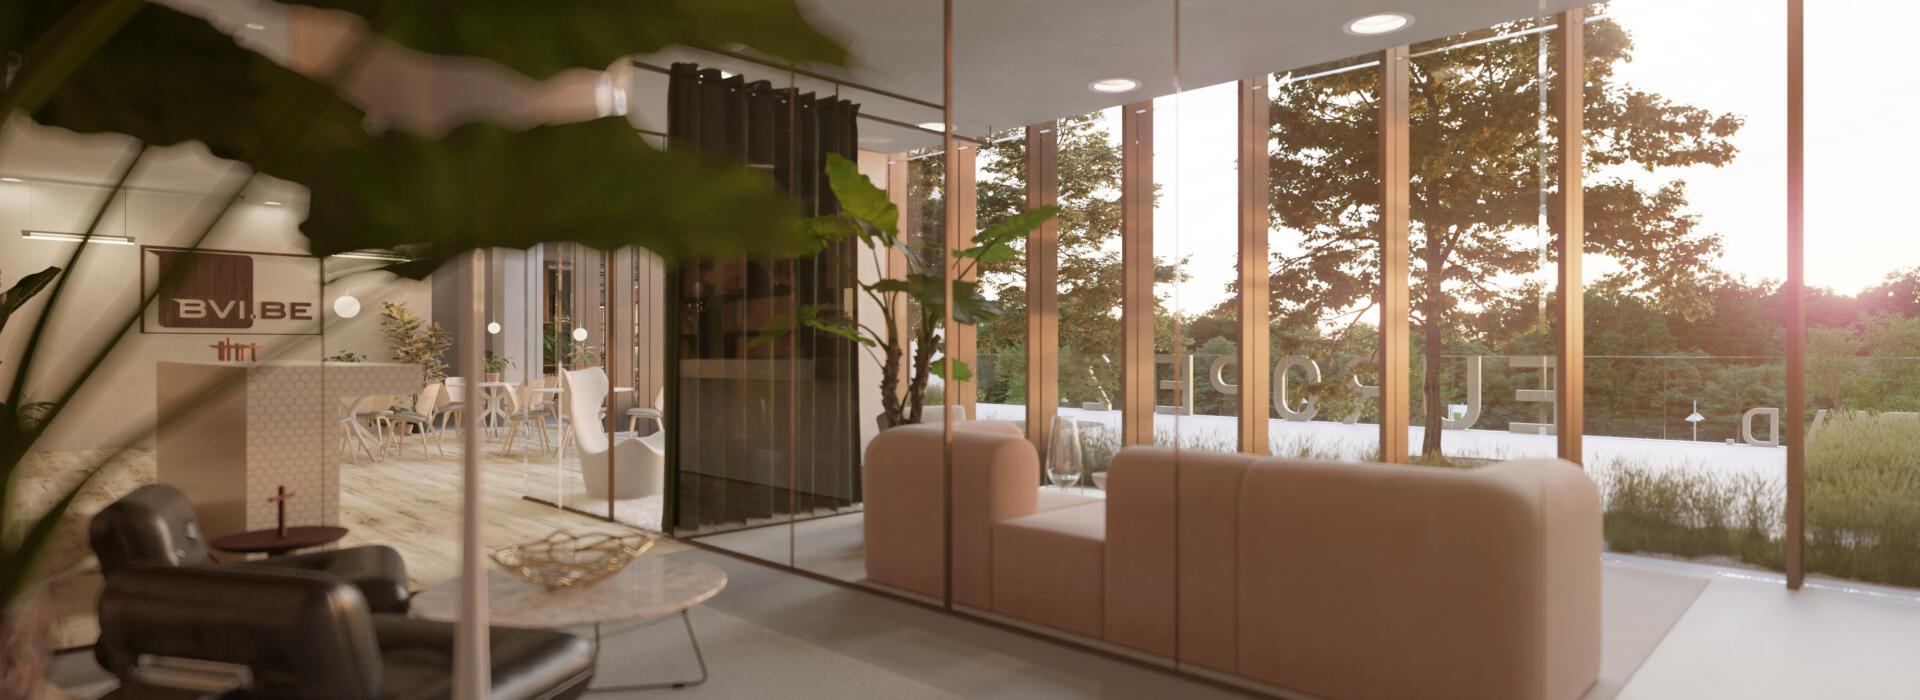 kitchenette lounge 1_architecture